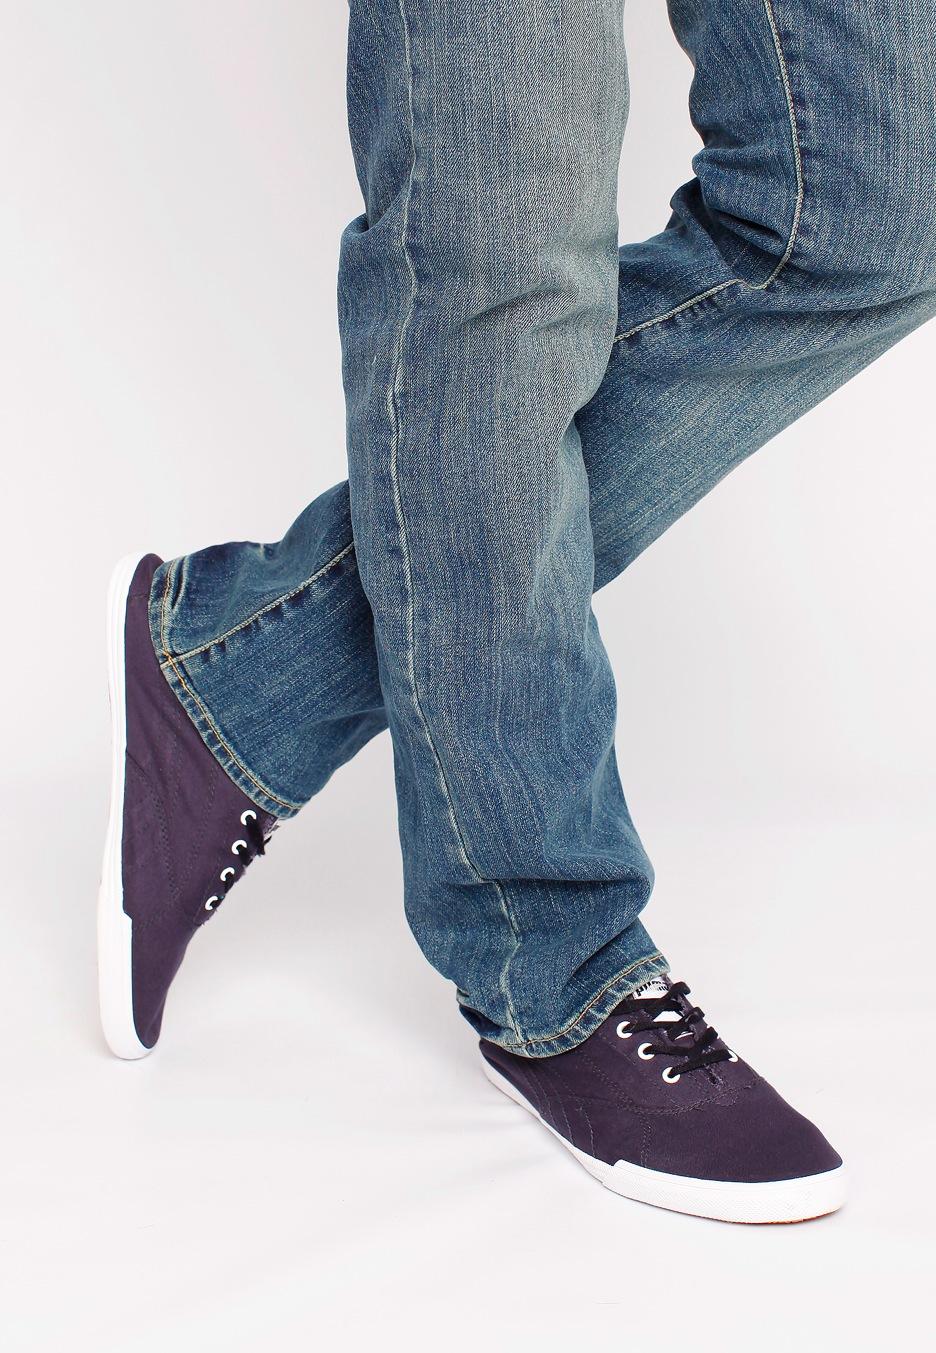 Puma Tekkies Jam Mood Indigo Shoes